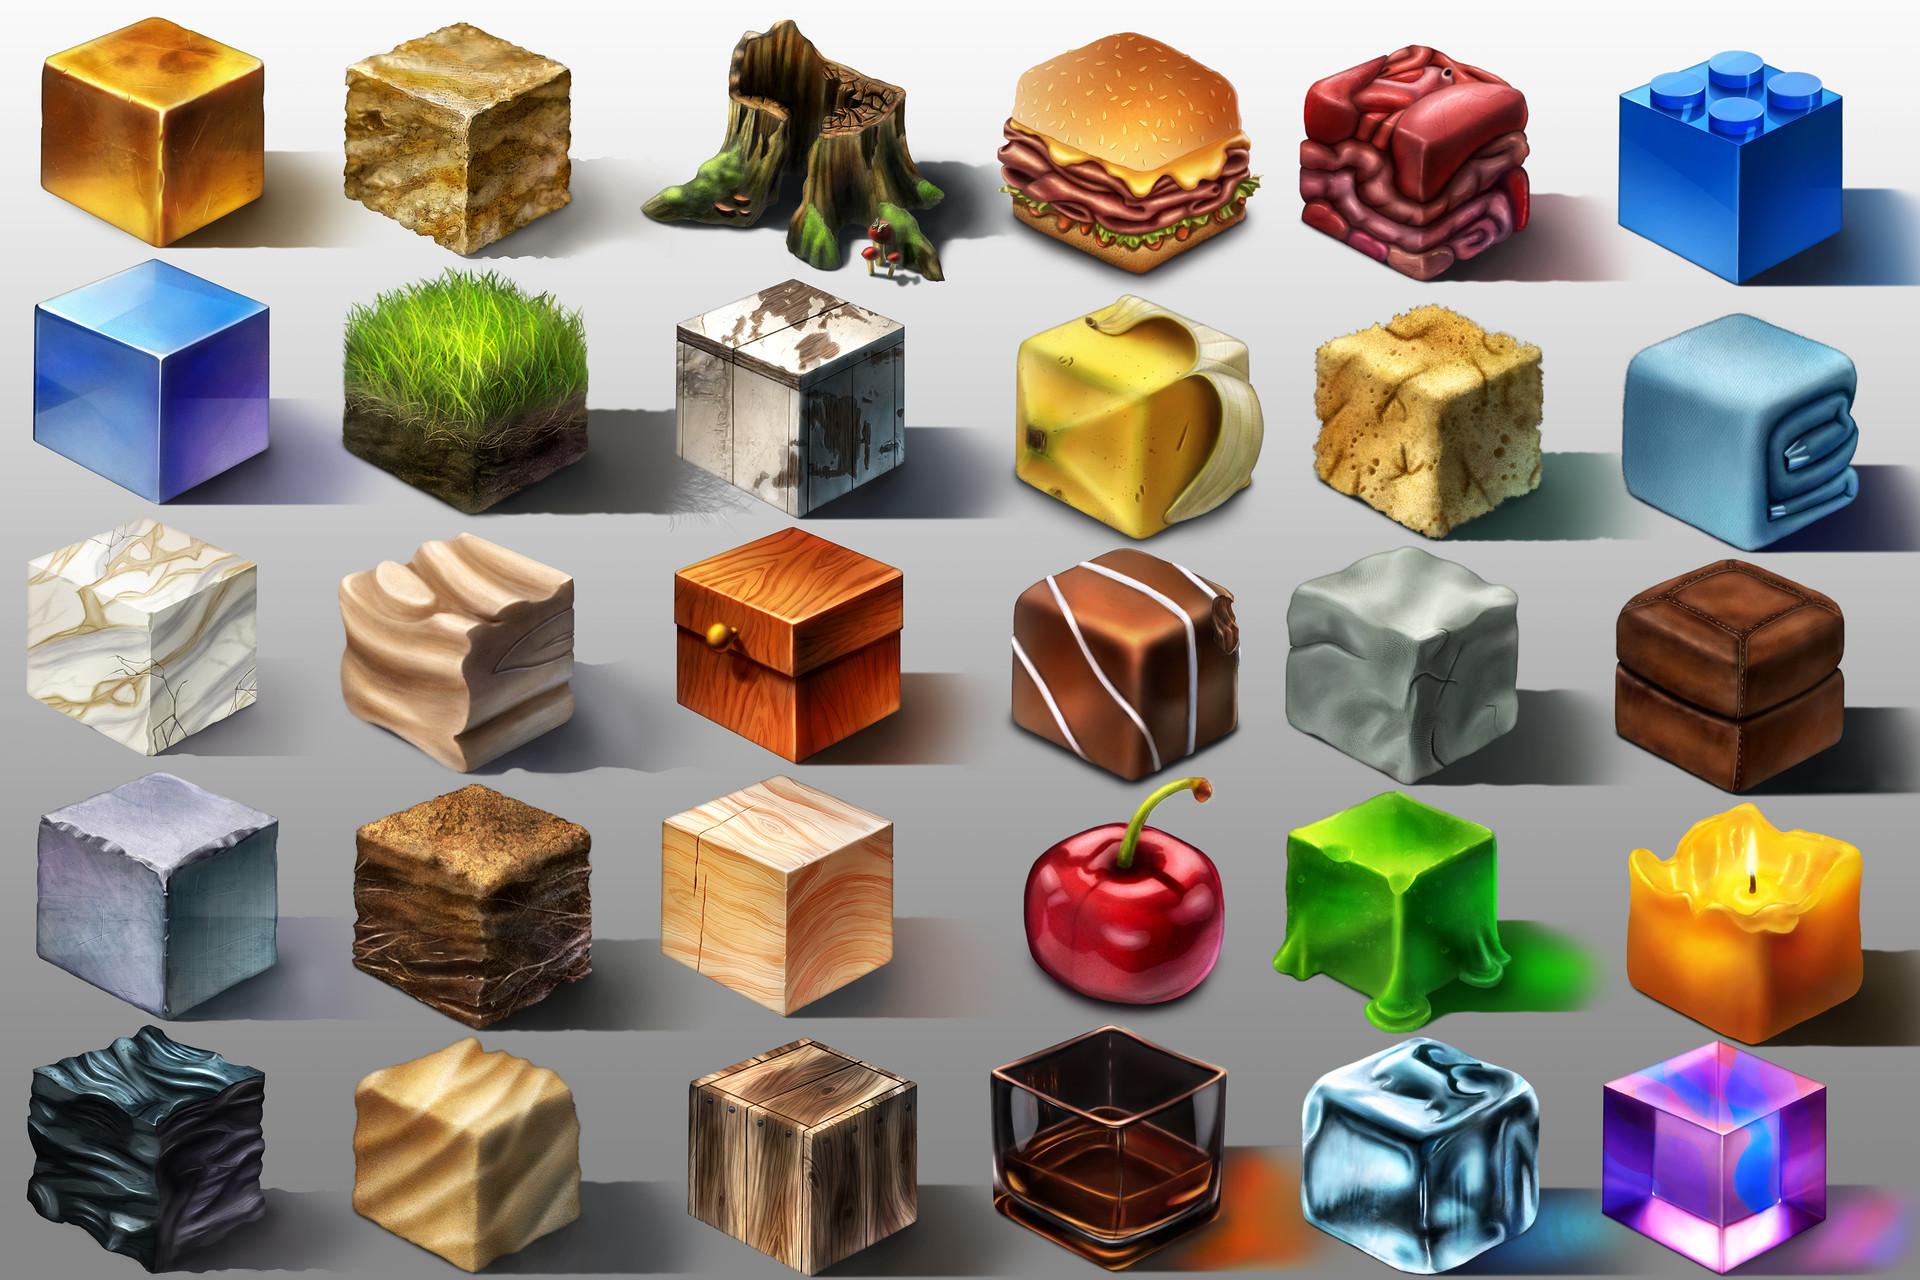 Sean guzman sean guzman texture cube studies